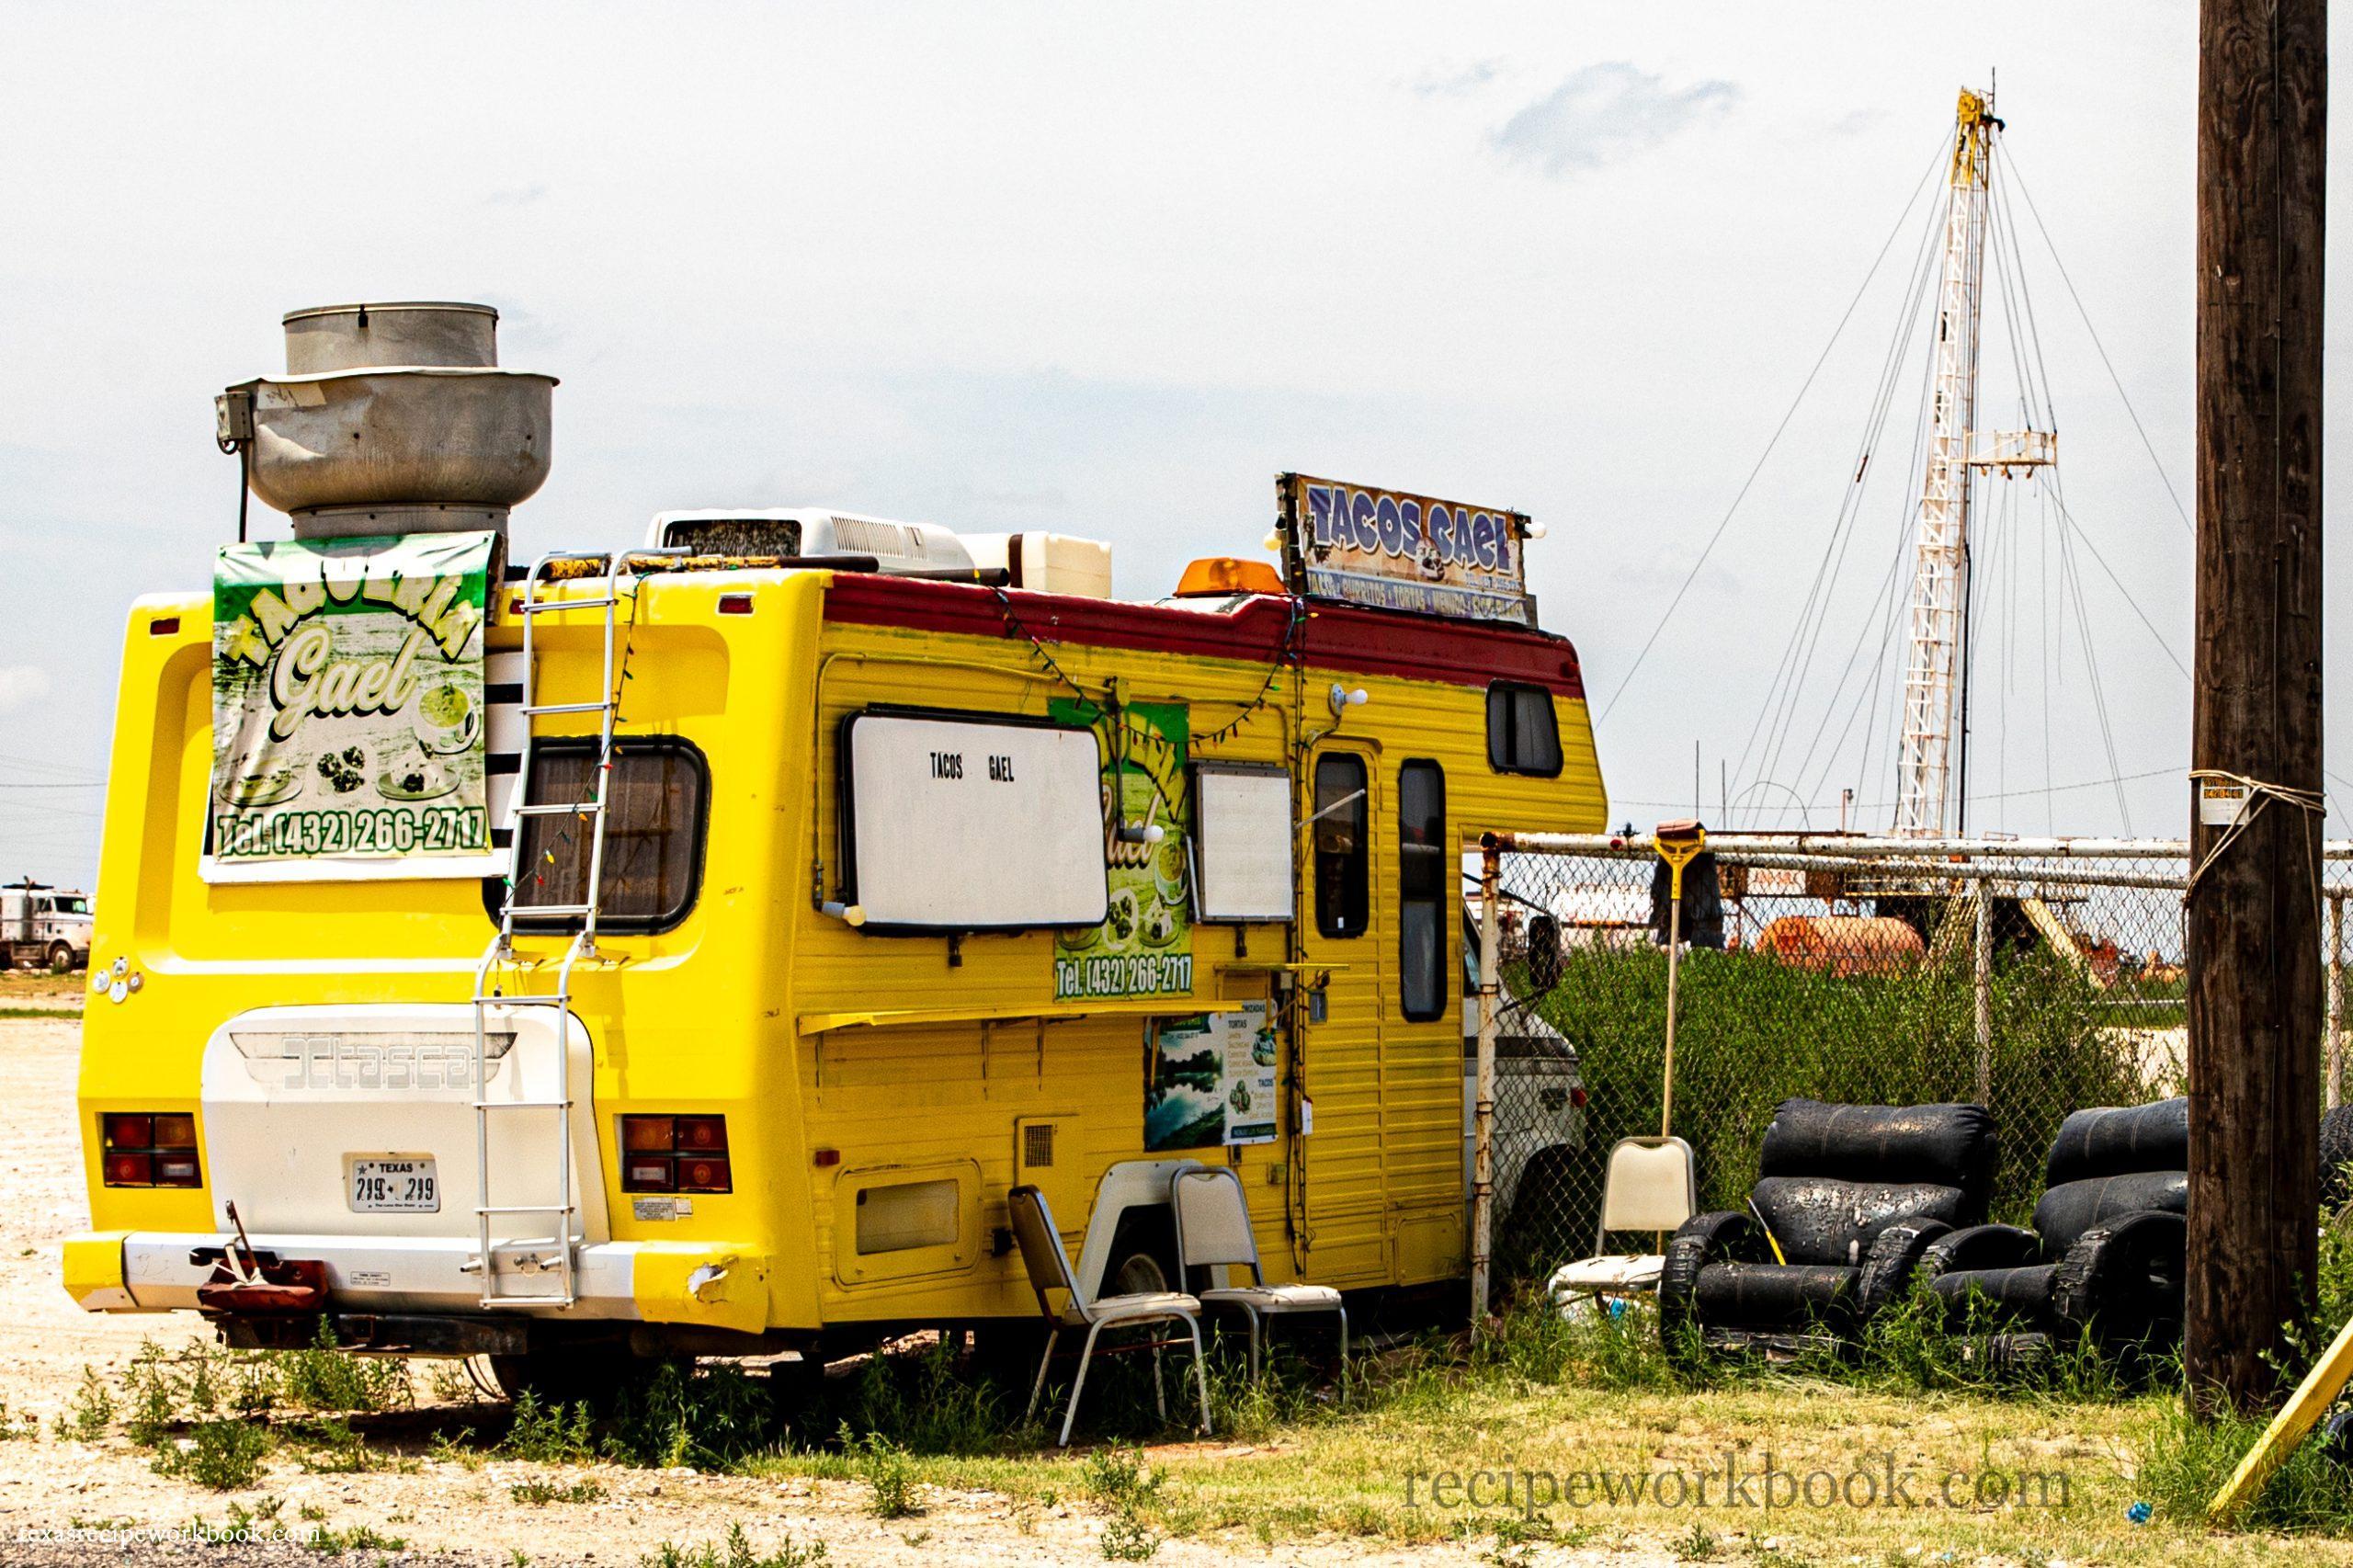 Tacos Gael - Andrews, Texas